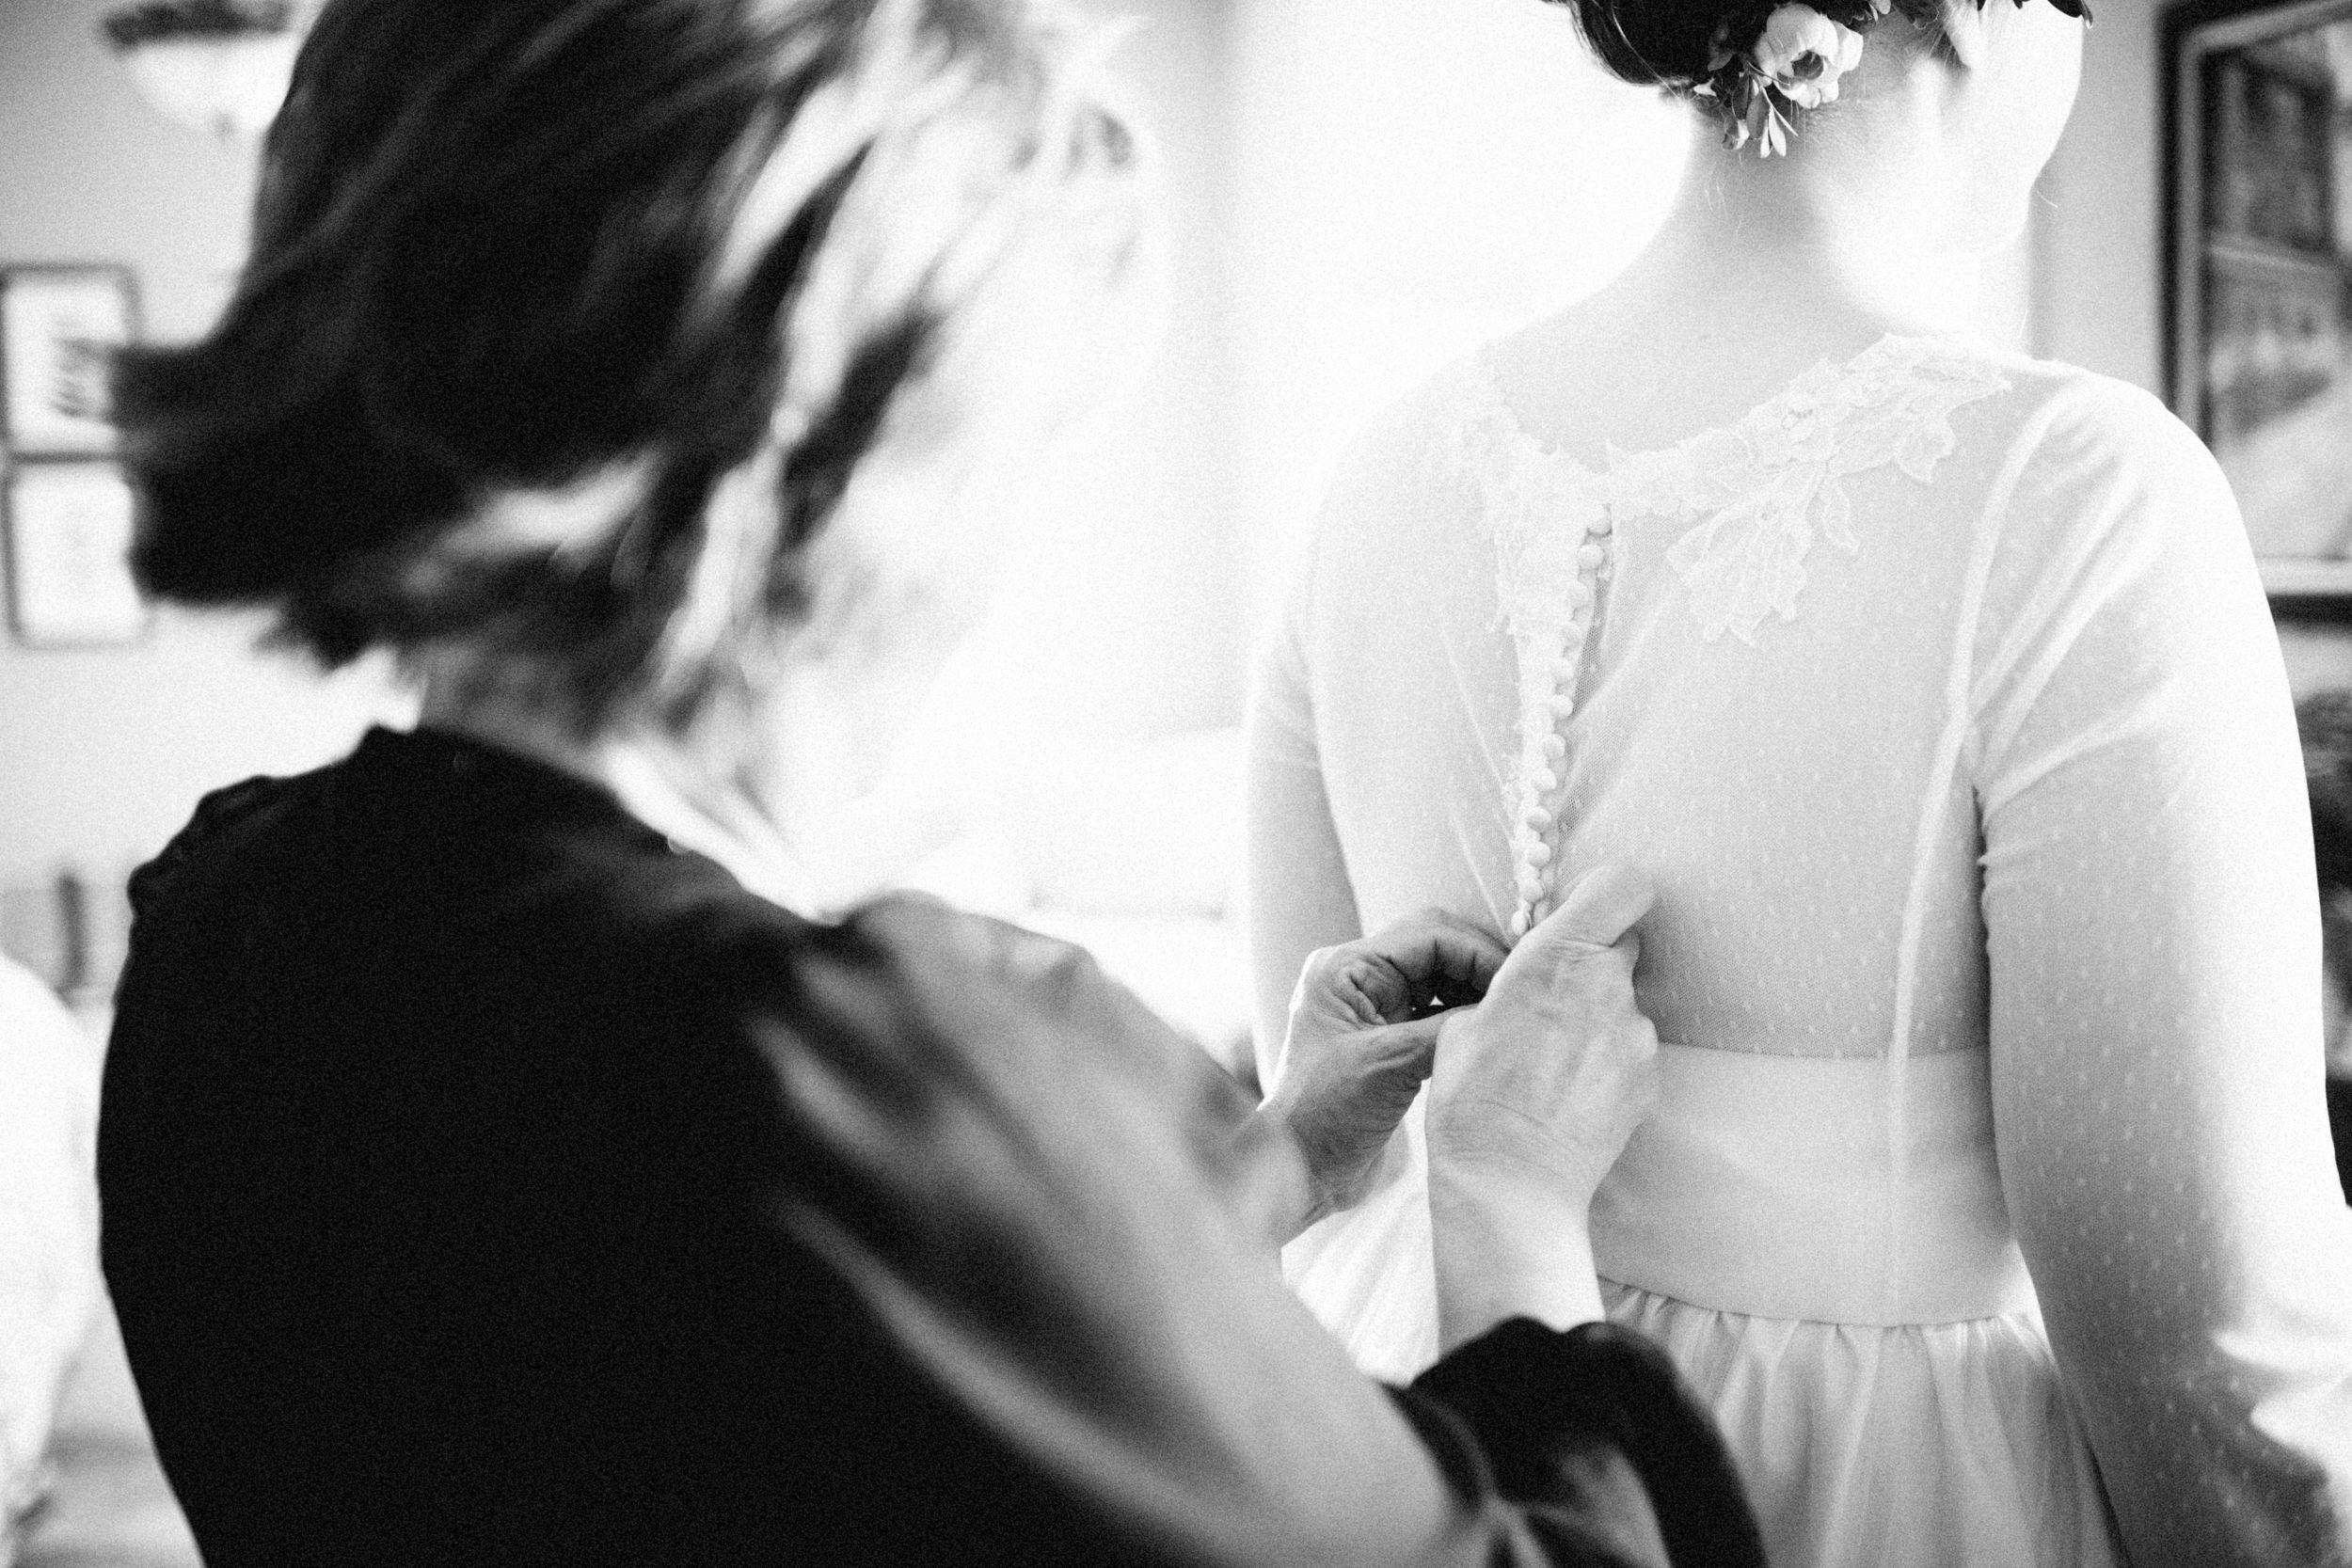 lauren-dean-wedding-grand-lodge-kentucky-sarah-katherine-davis-photography-80edit.jpg